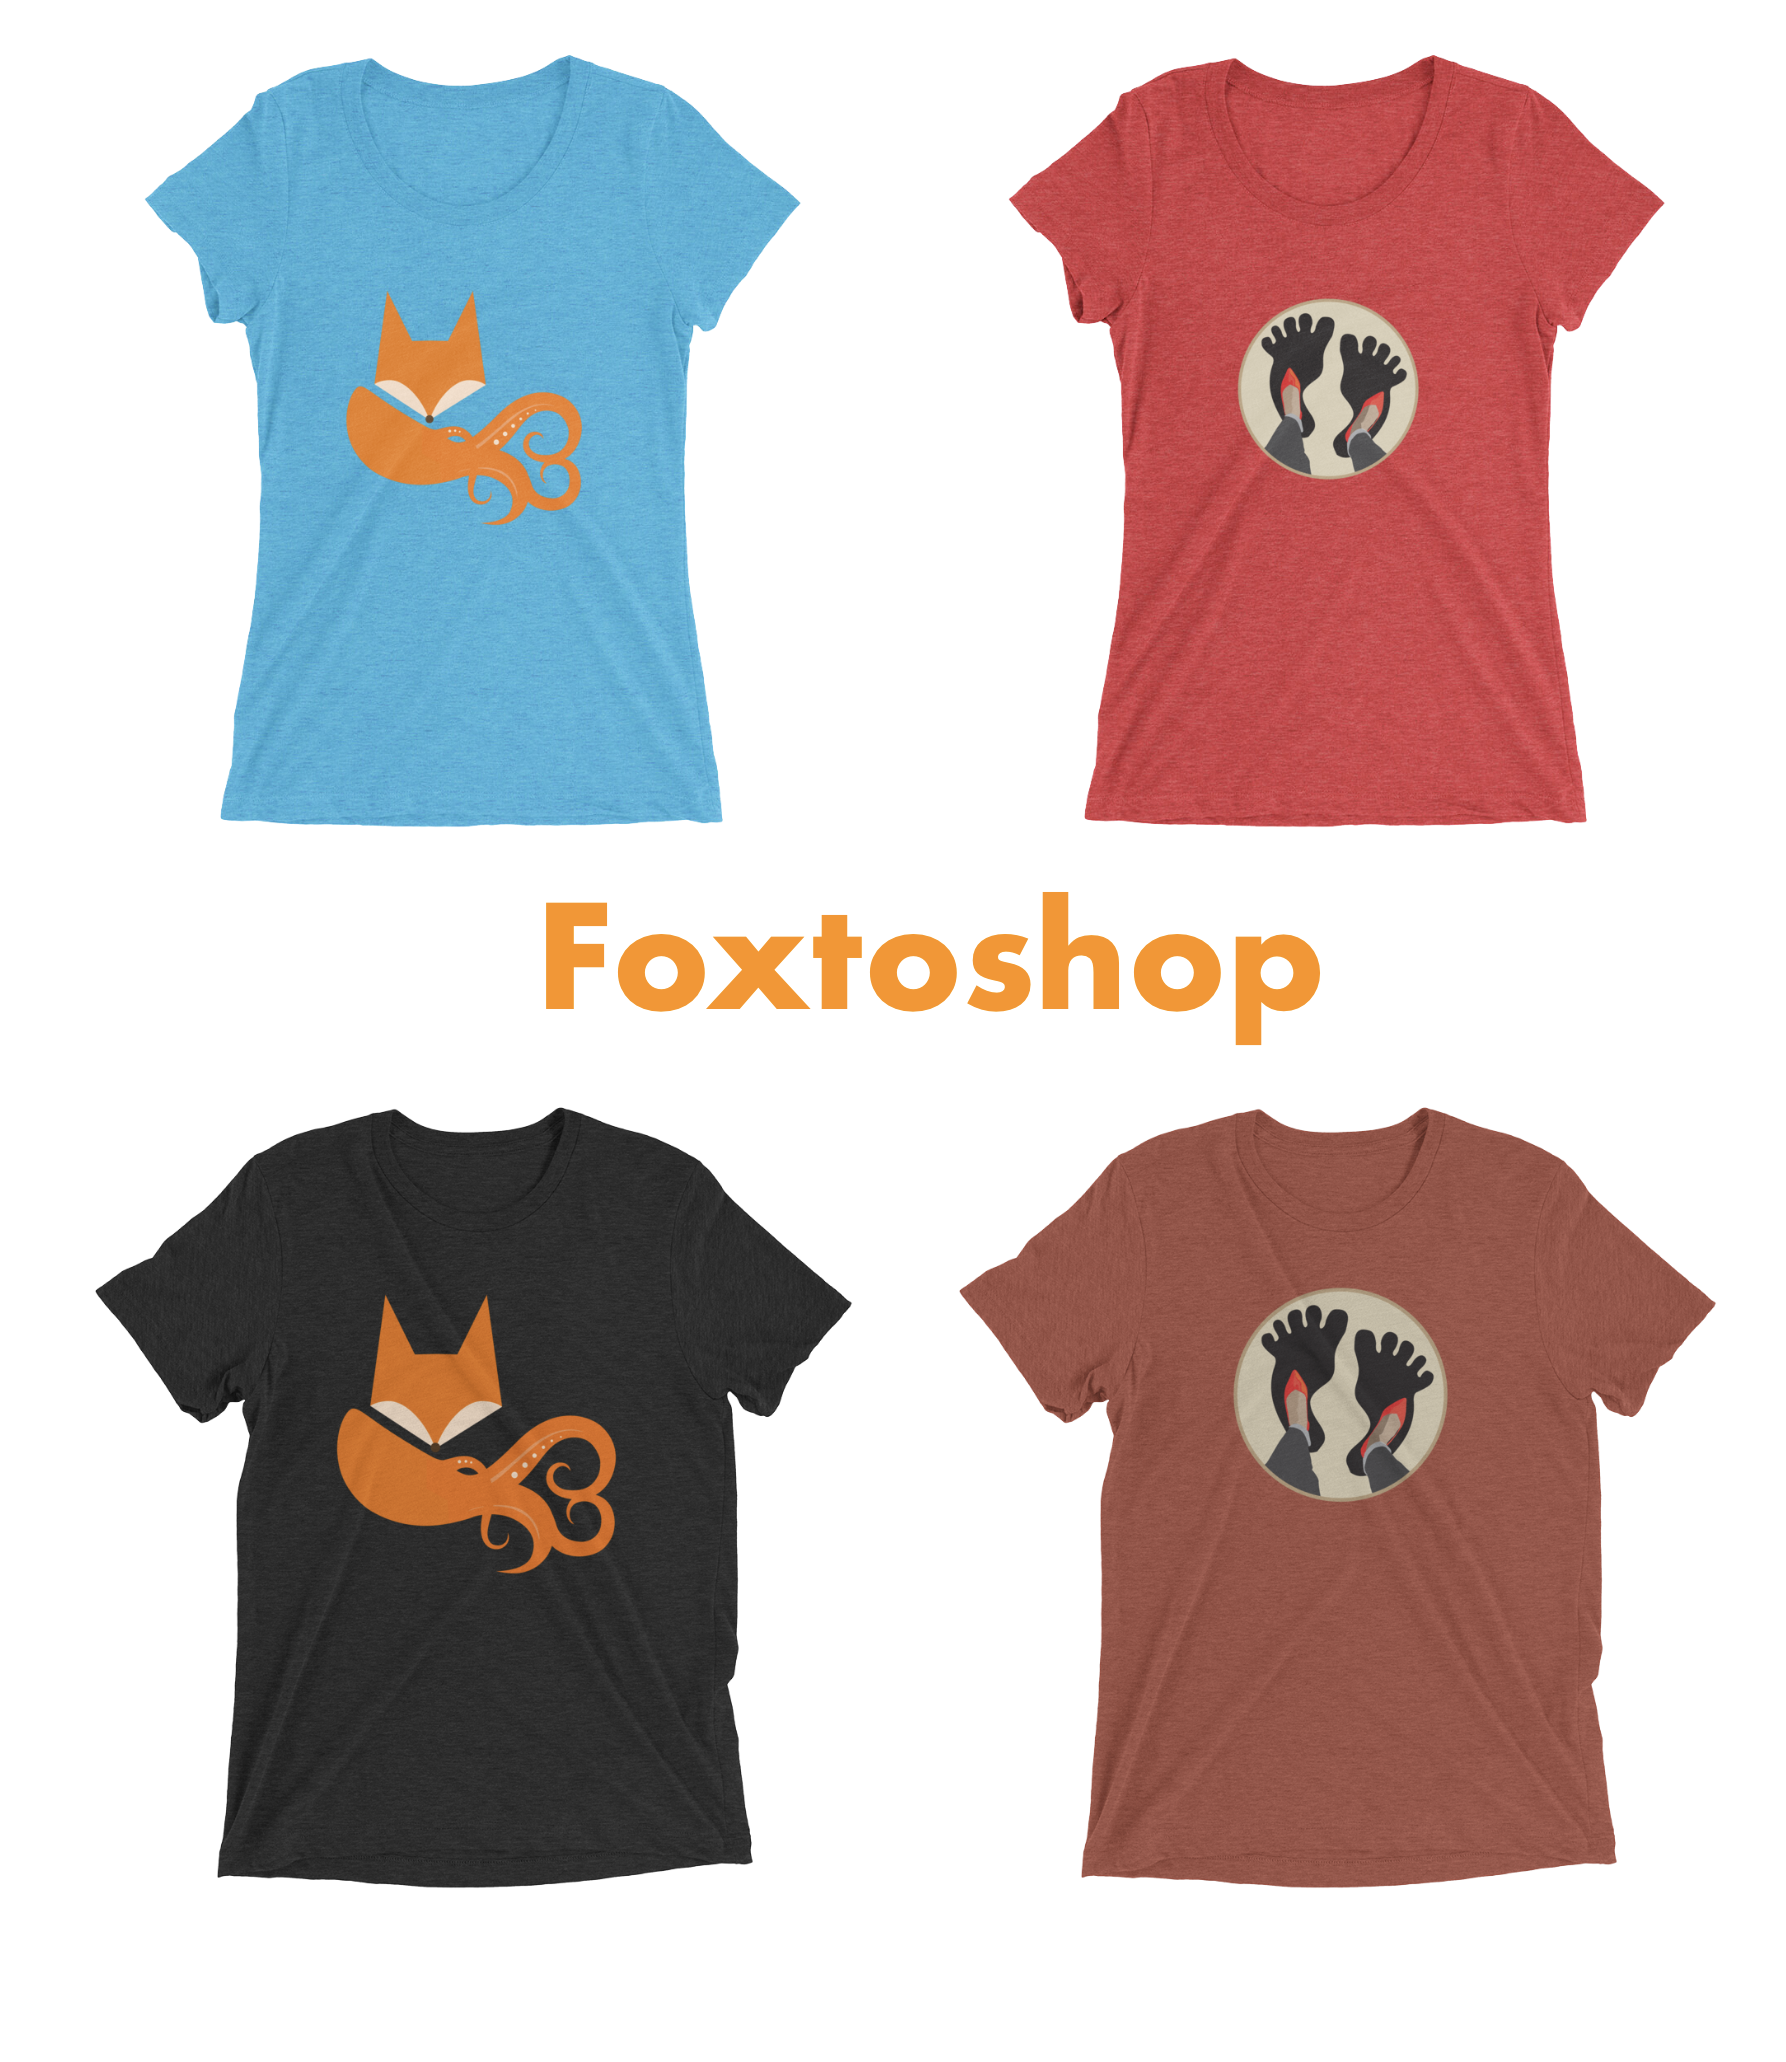 Foxtoshop.png